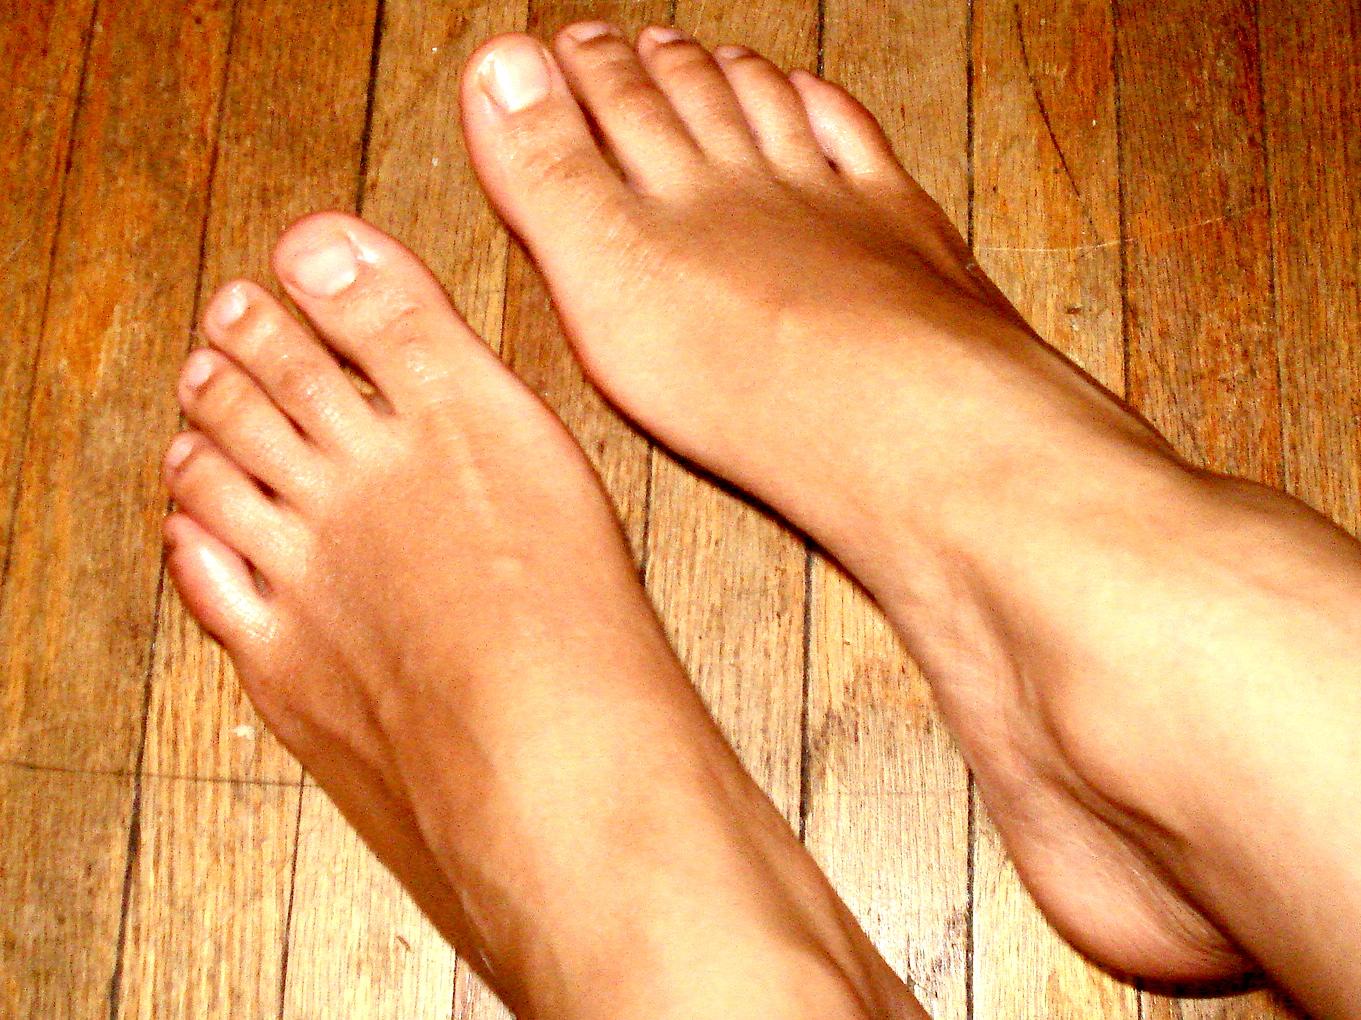 feet womens brown tanned